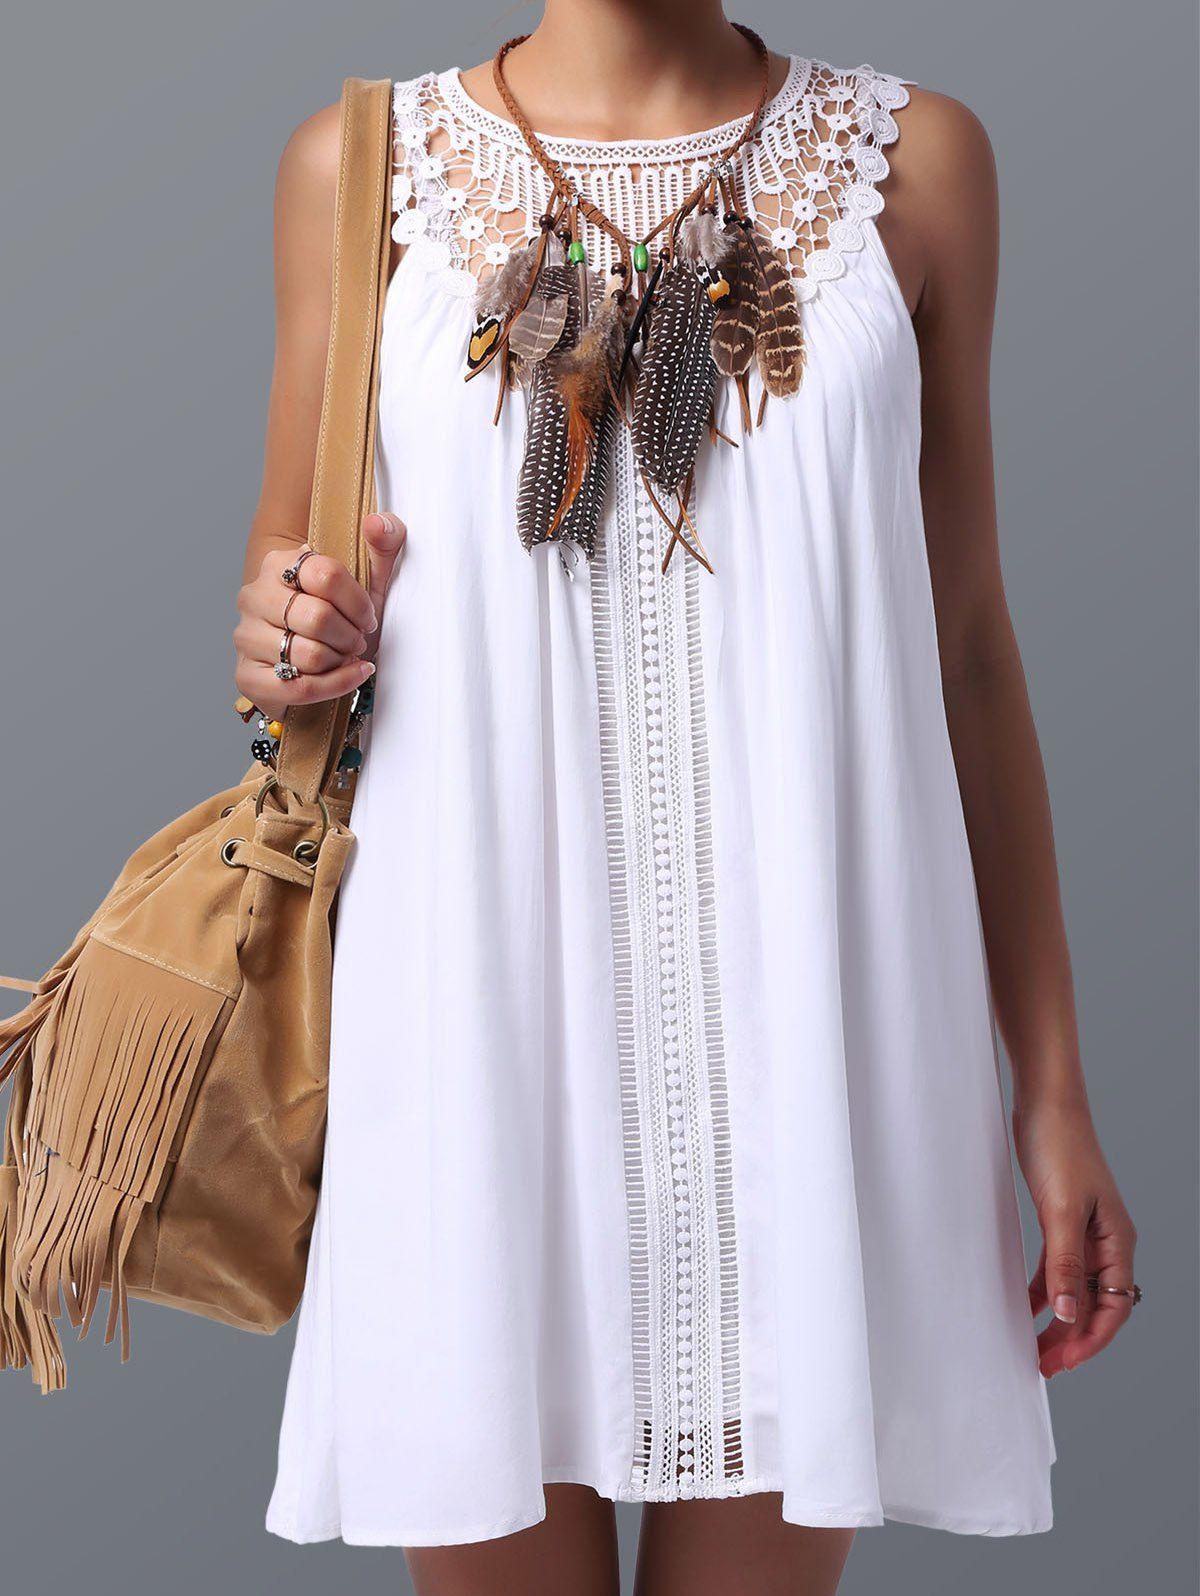 f22a279149a6f8 GAMISS - Women s Trendy Lace Spliced Sleeveless Dress